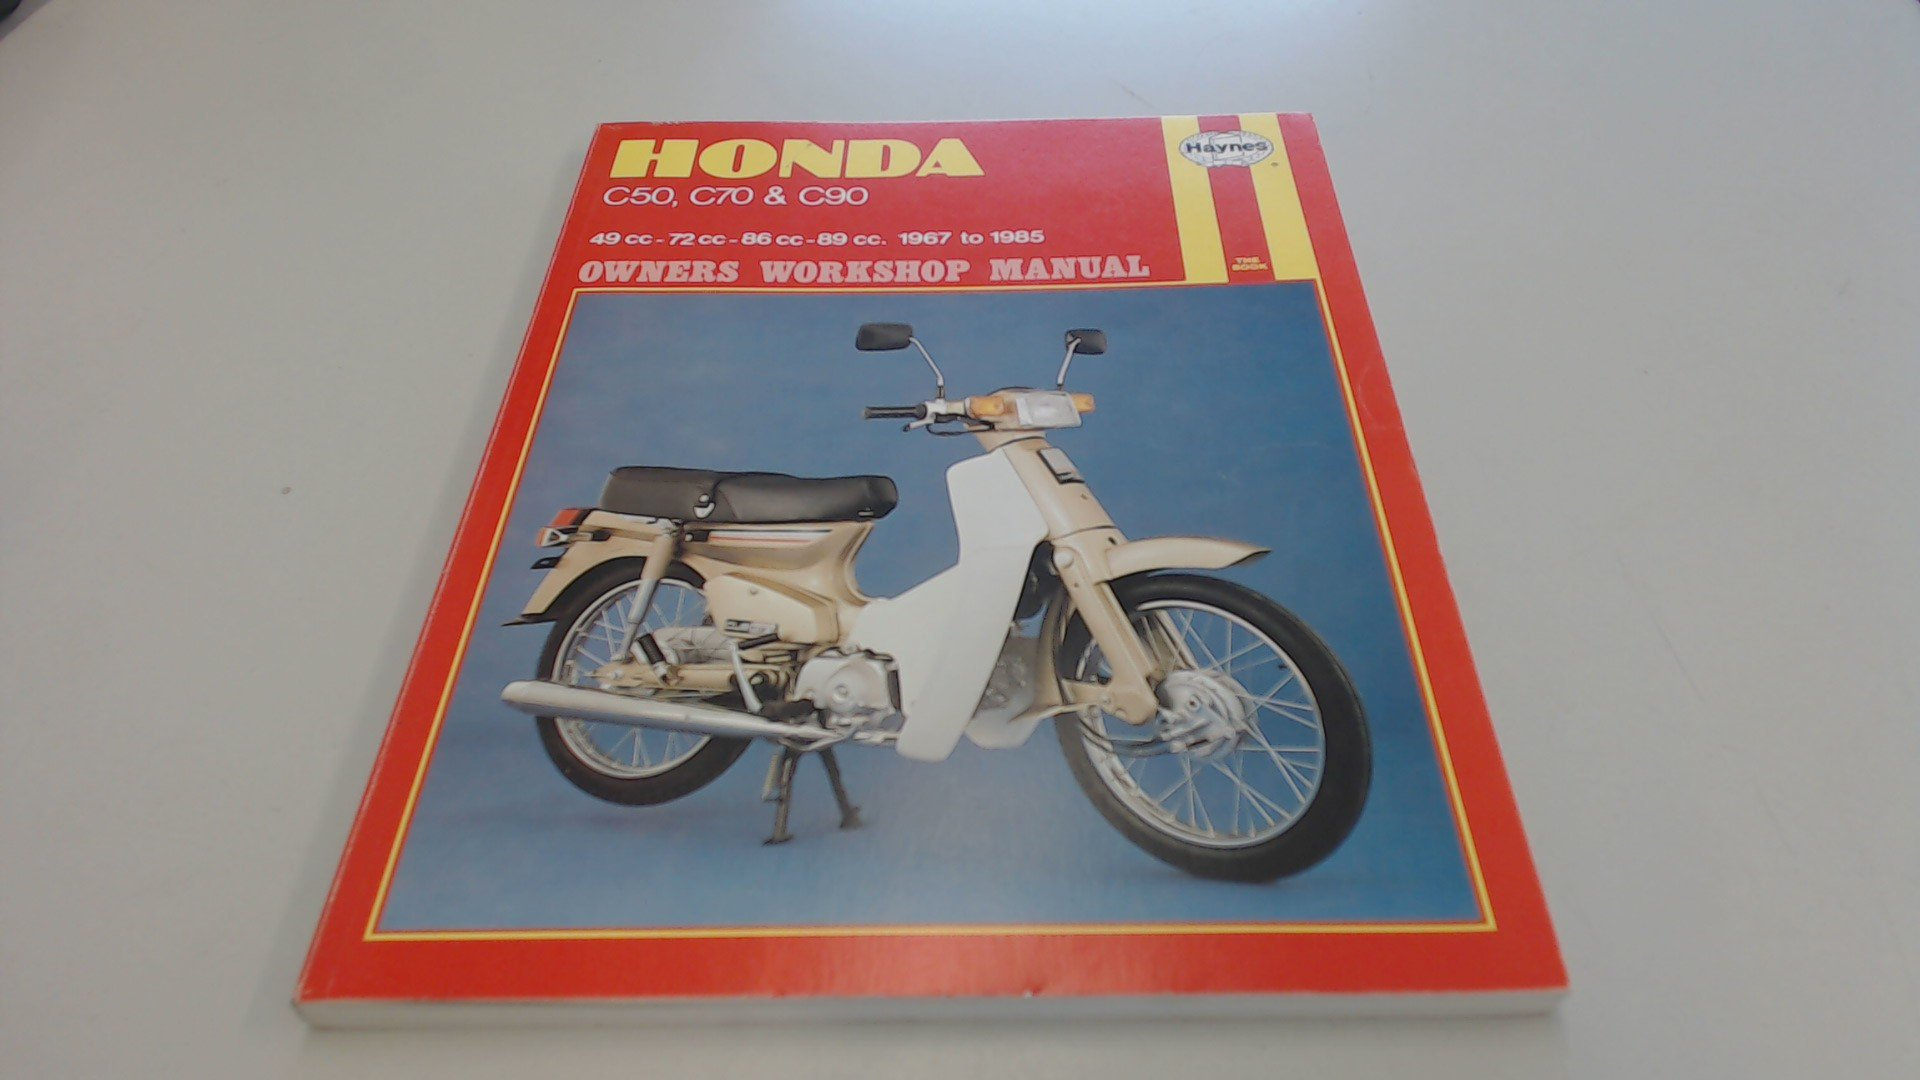 Honda C50, C70 and C90 Owner's Workshop Manual: Amazon.co.uk: Mansur  Darlington, Mervyn Bleach, Jeremy Churchill: 9781850102120: Books